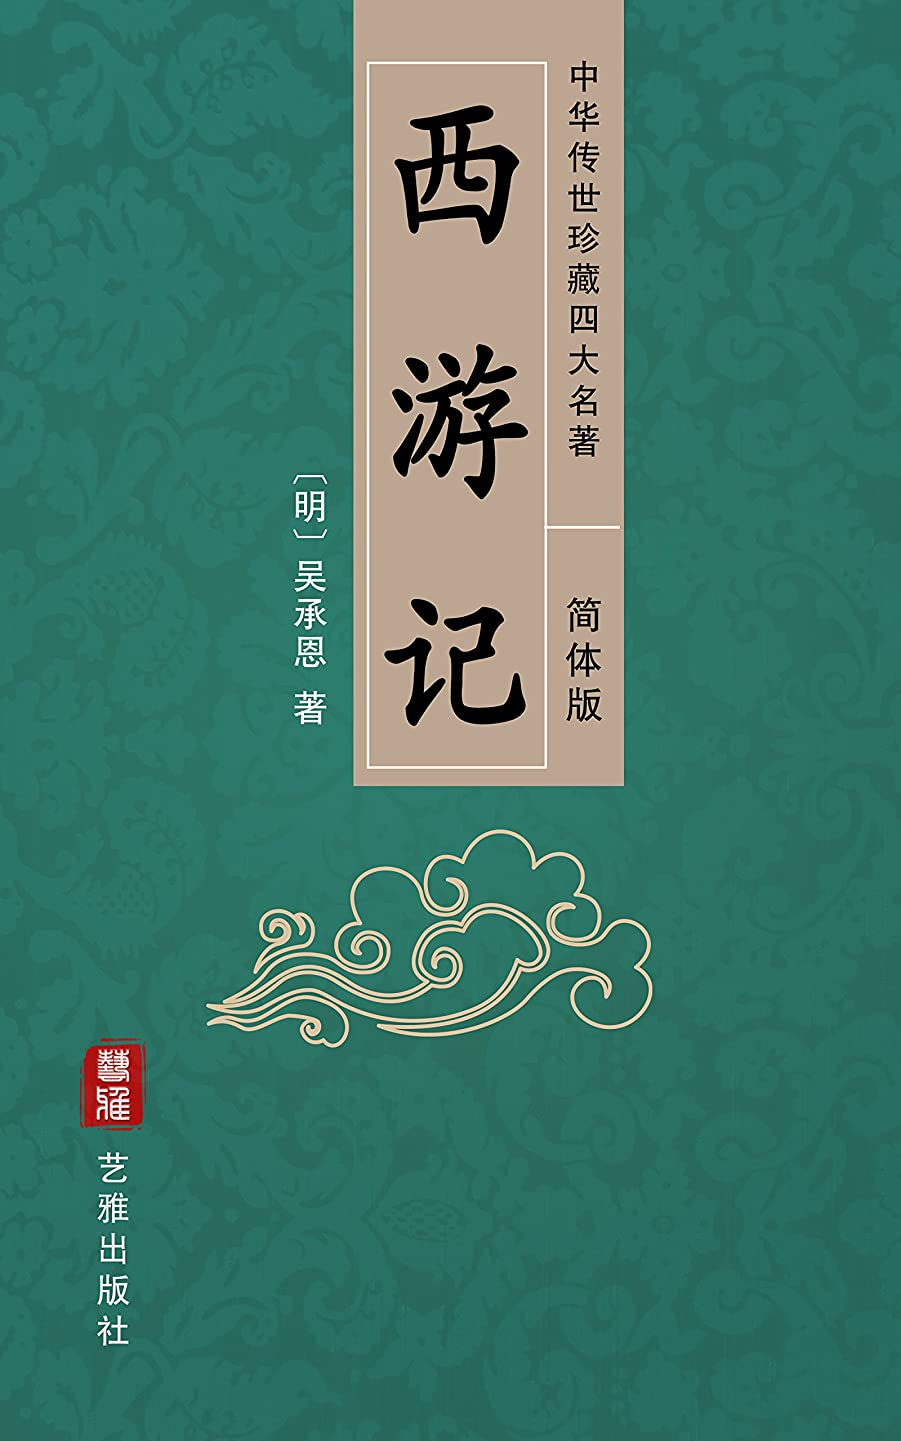 肝ボールペッカディロ西游记(简体中文版)--中华传世珍藏四大名著: 一段荒诞奇妙的神话探险之旅 (Chinese Edition)